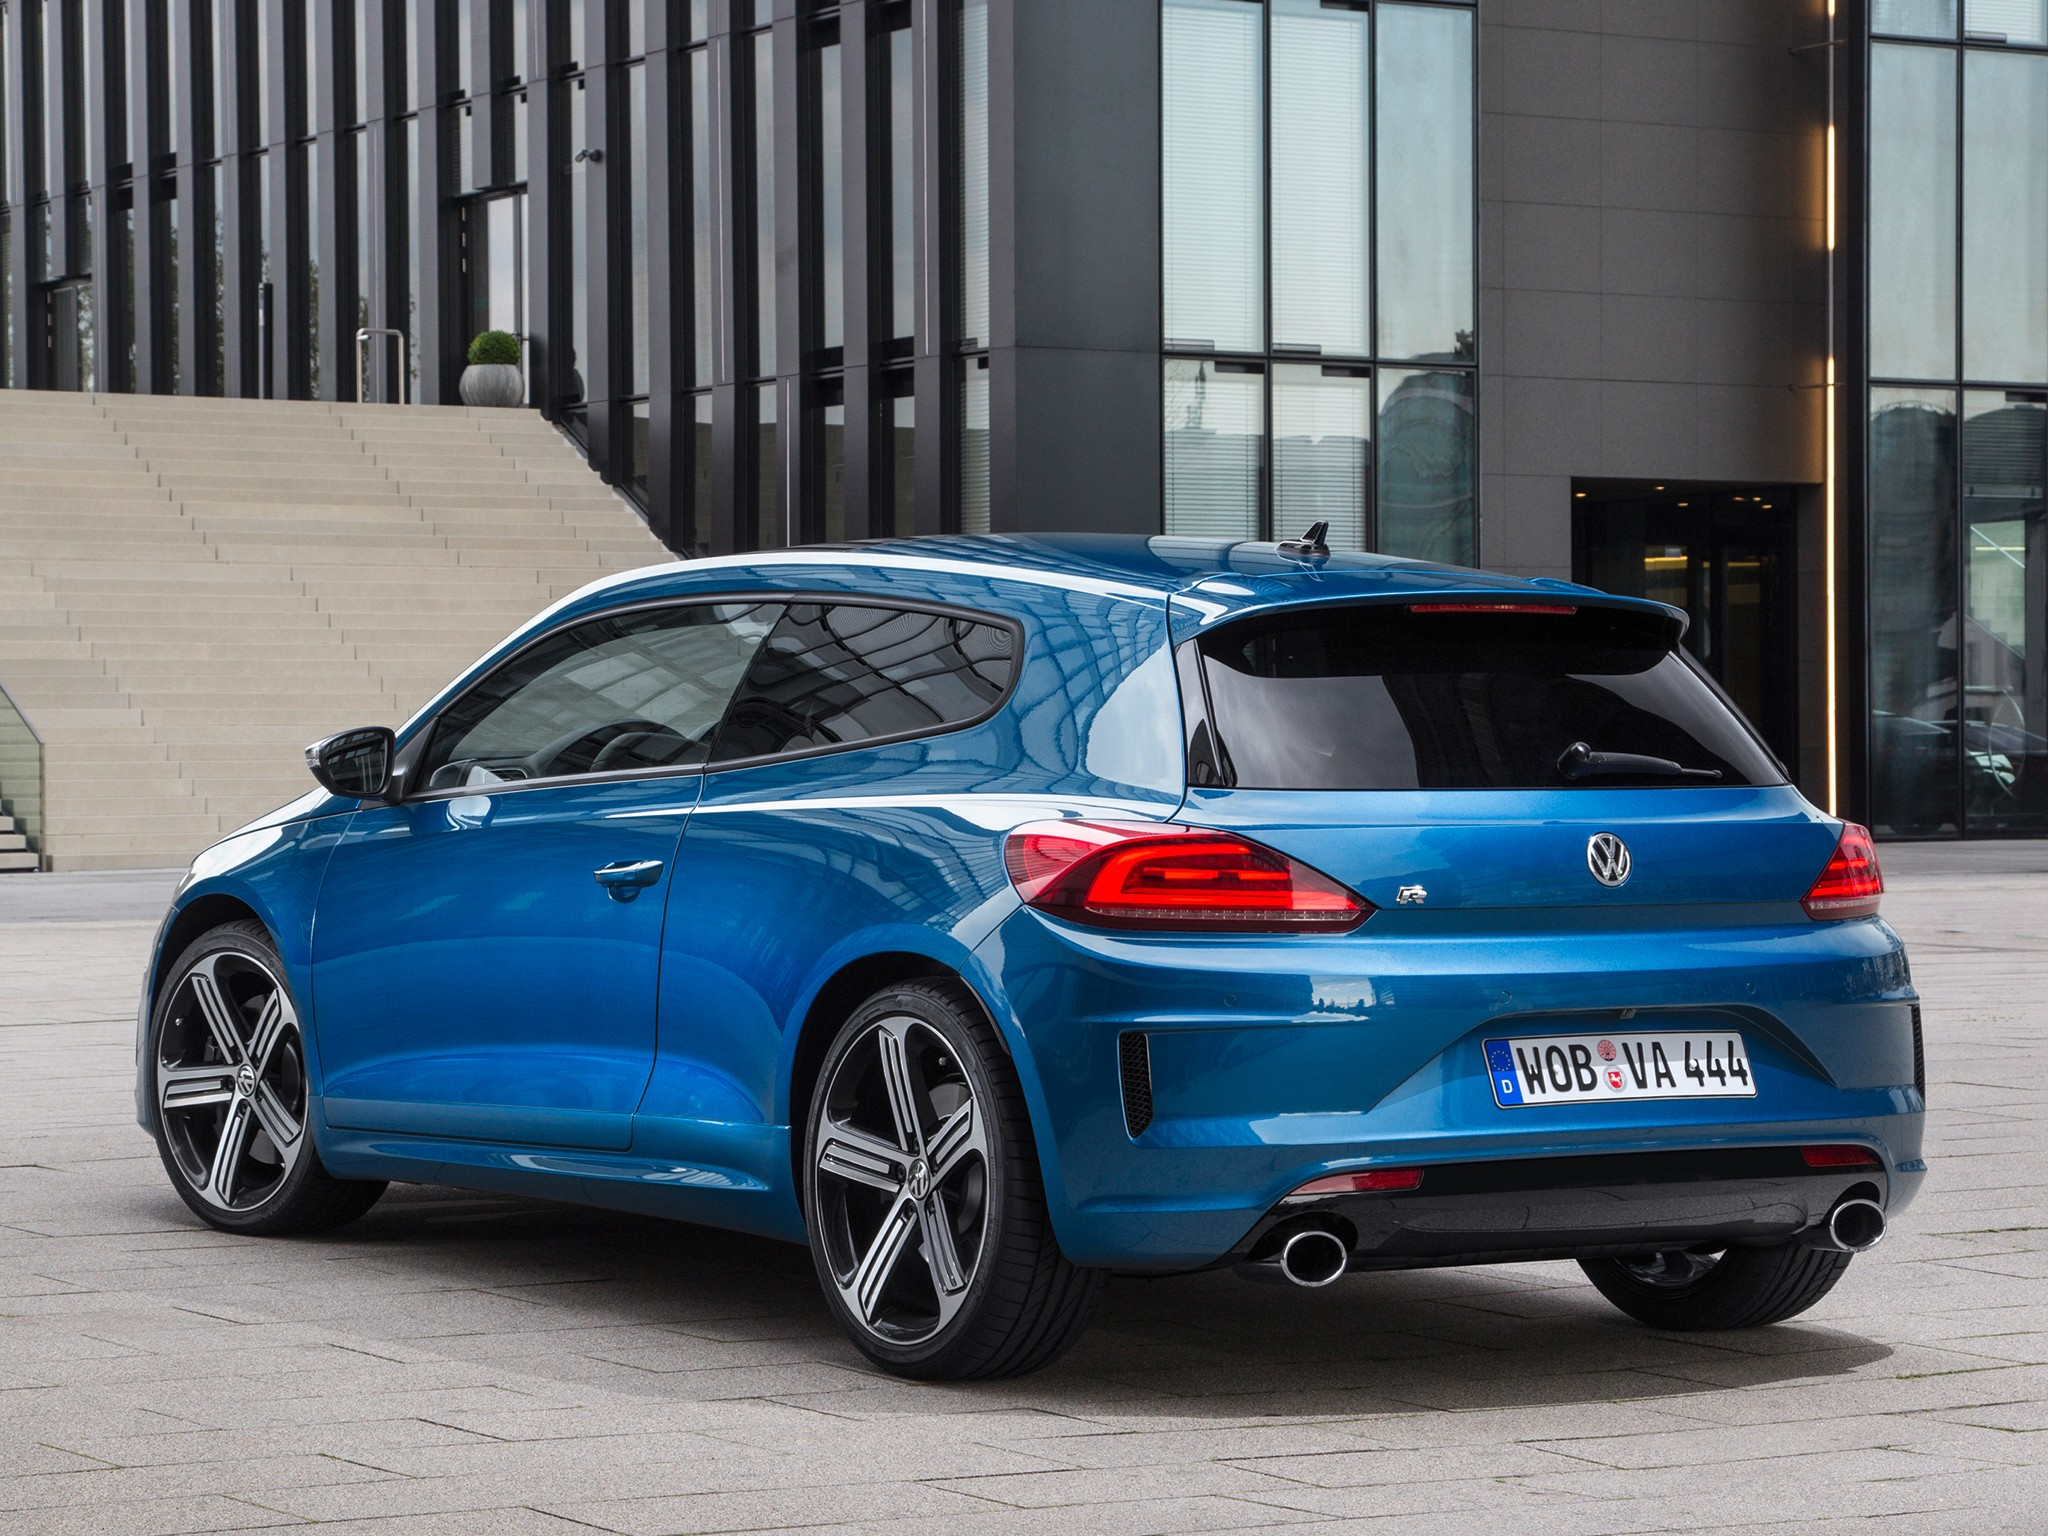 2017 Volkswagen Golf Tsi S >> VOLKSWAGEN Scirocco R - 2014, 2015, 2016, 2017 - autoevolution